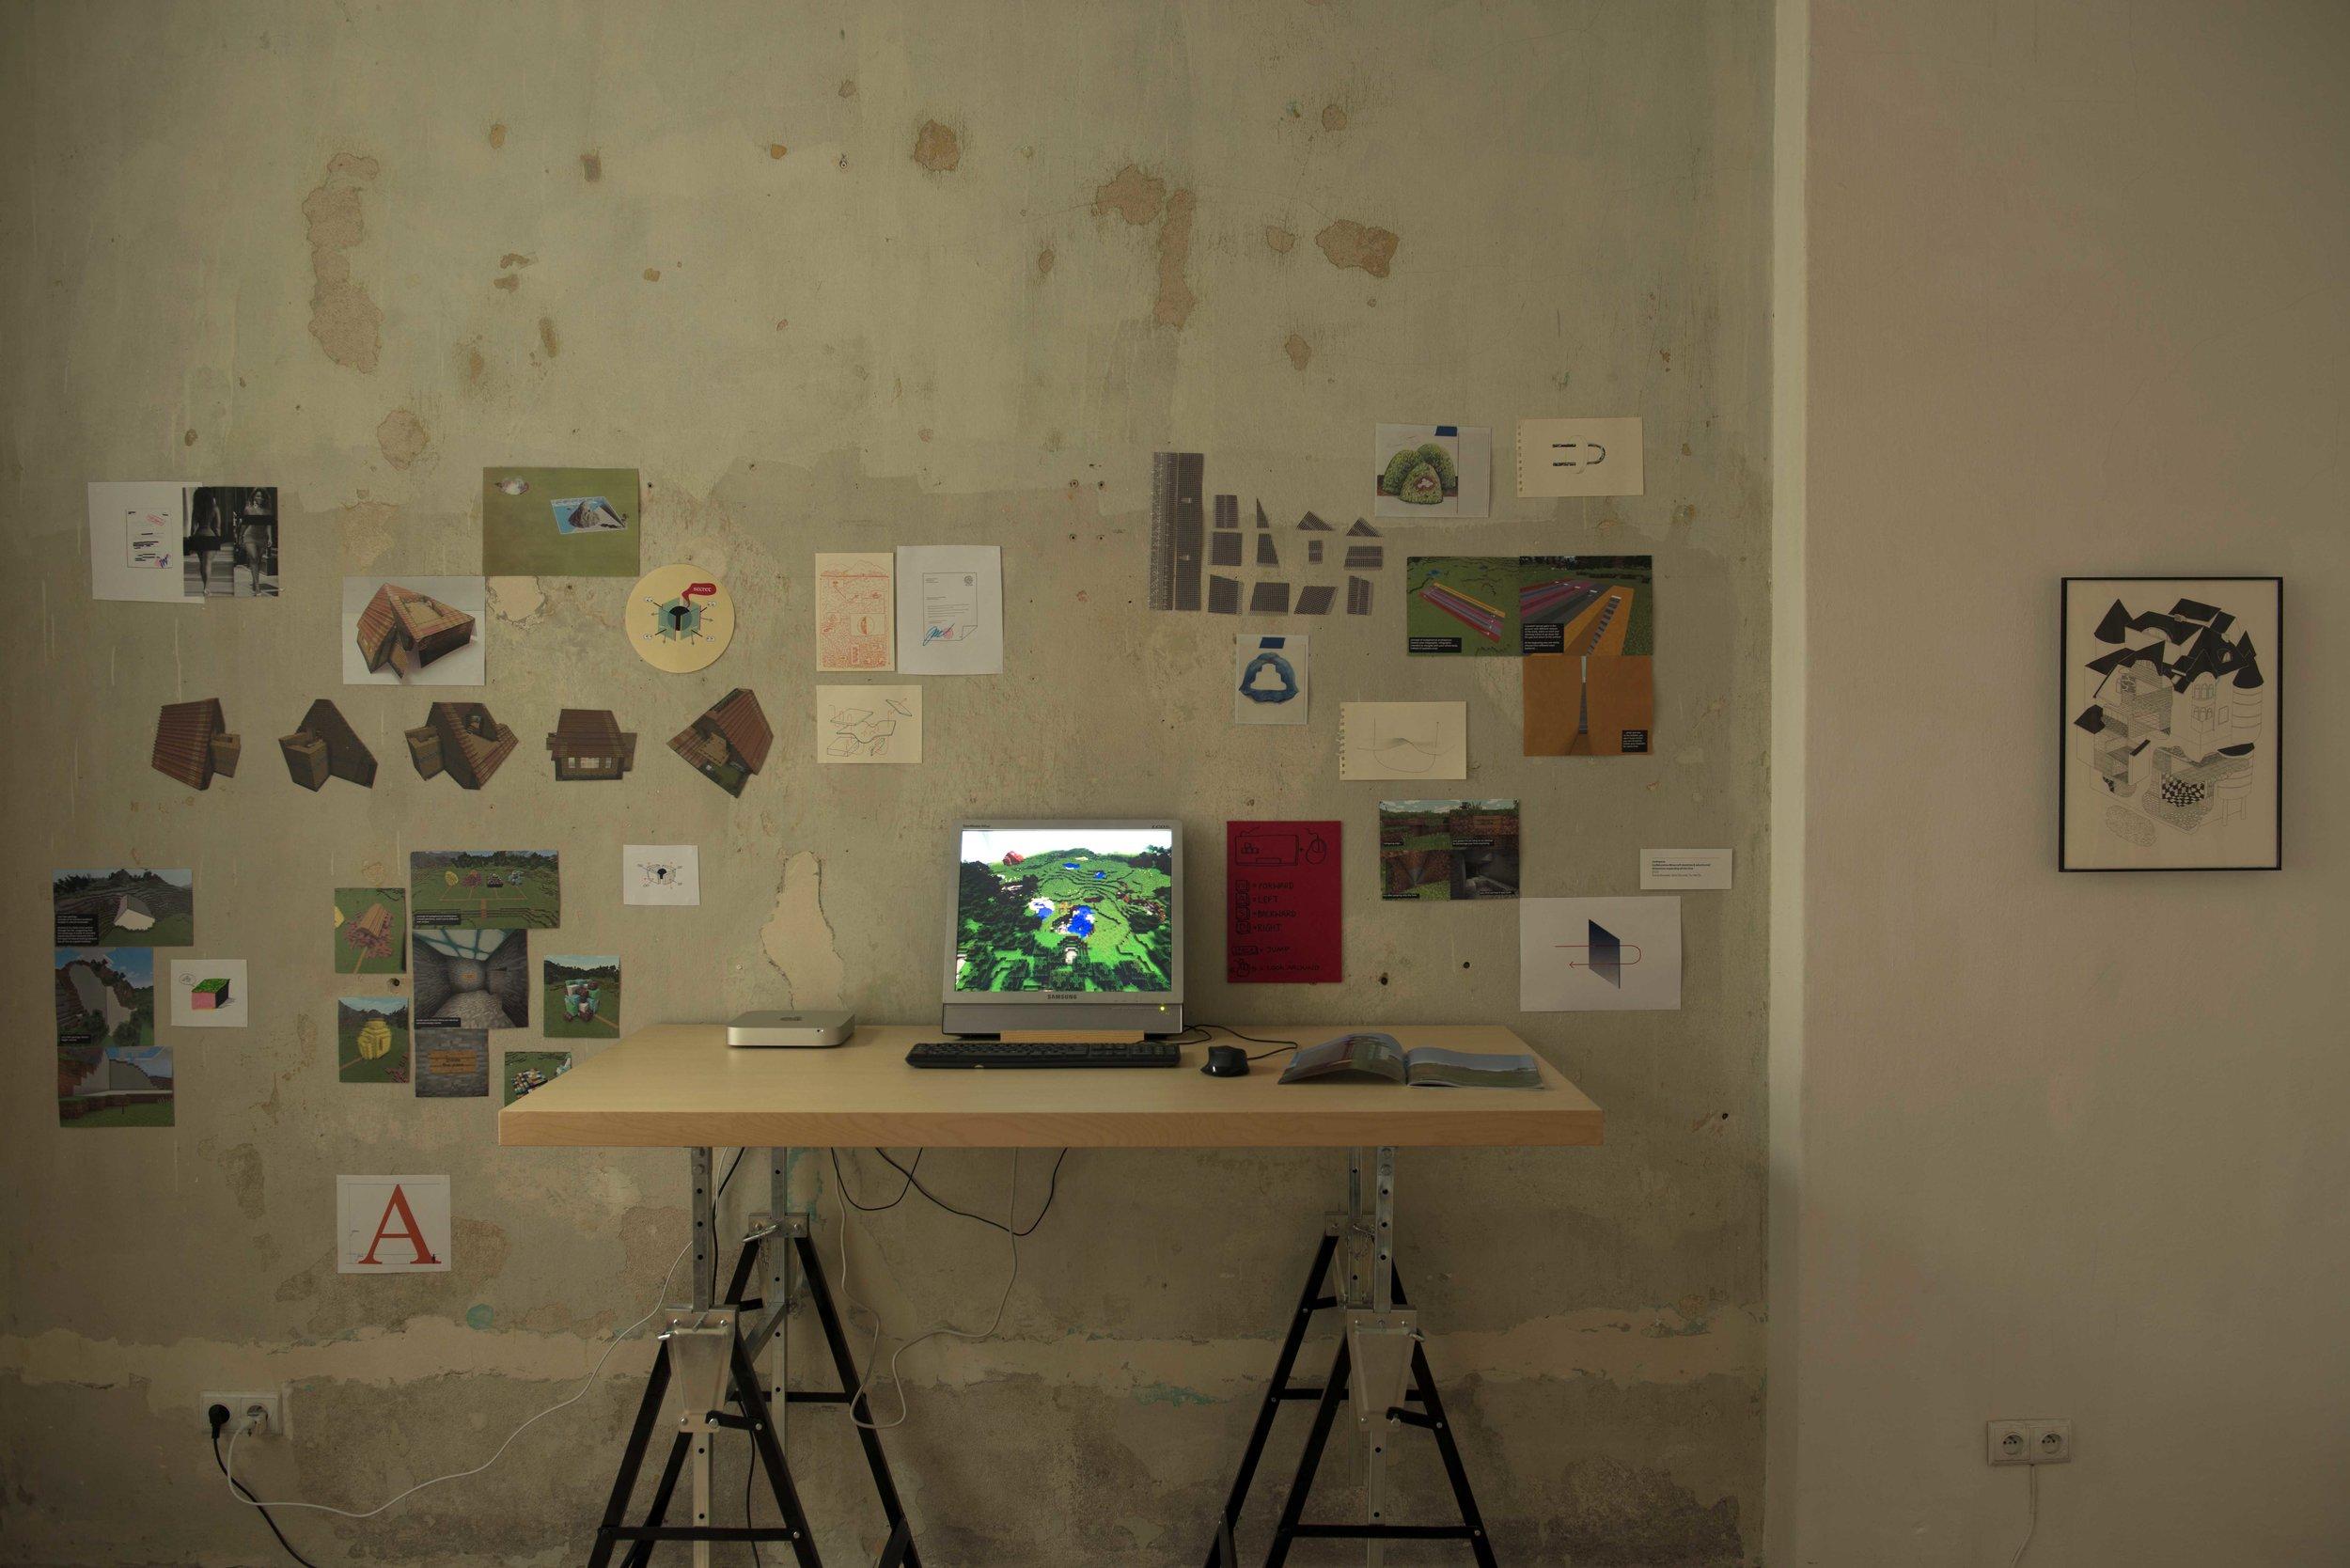 Collective work by Tymek Borowski, Rafał Dominik and Tzu Han Su